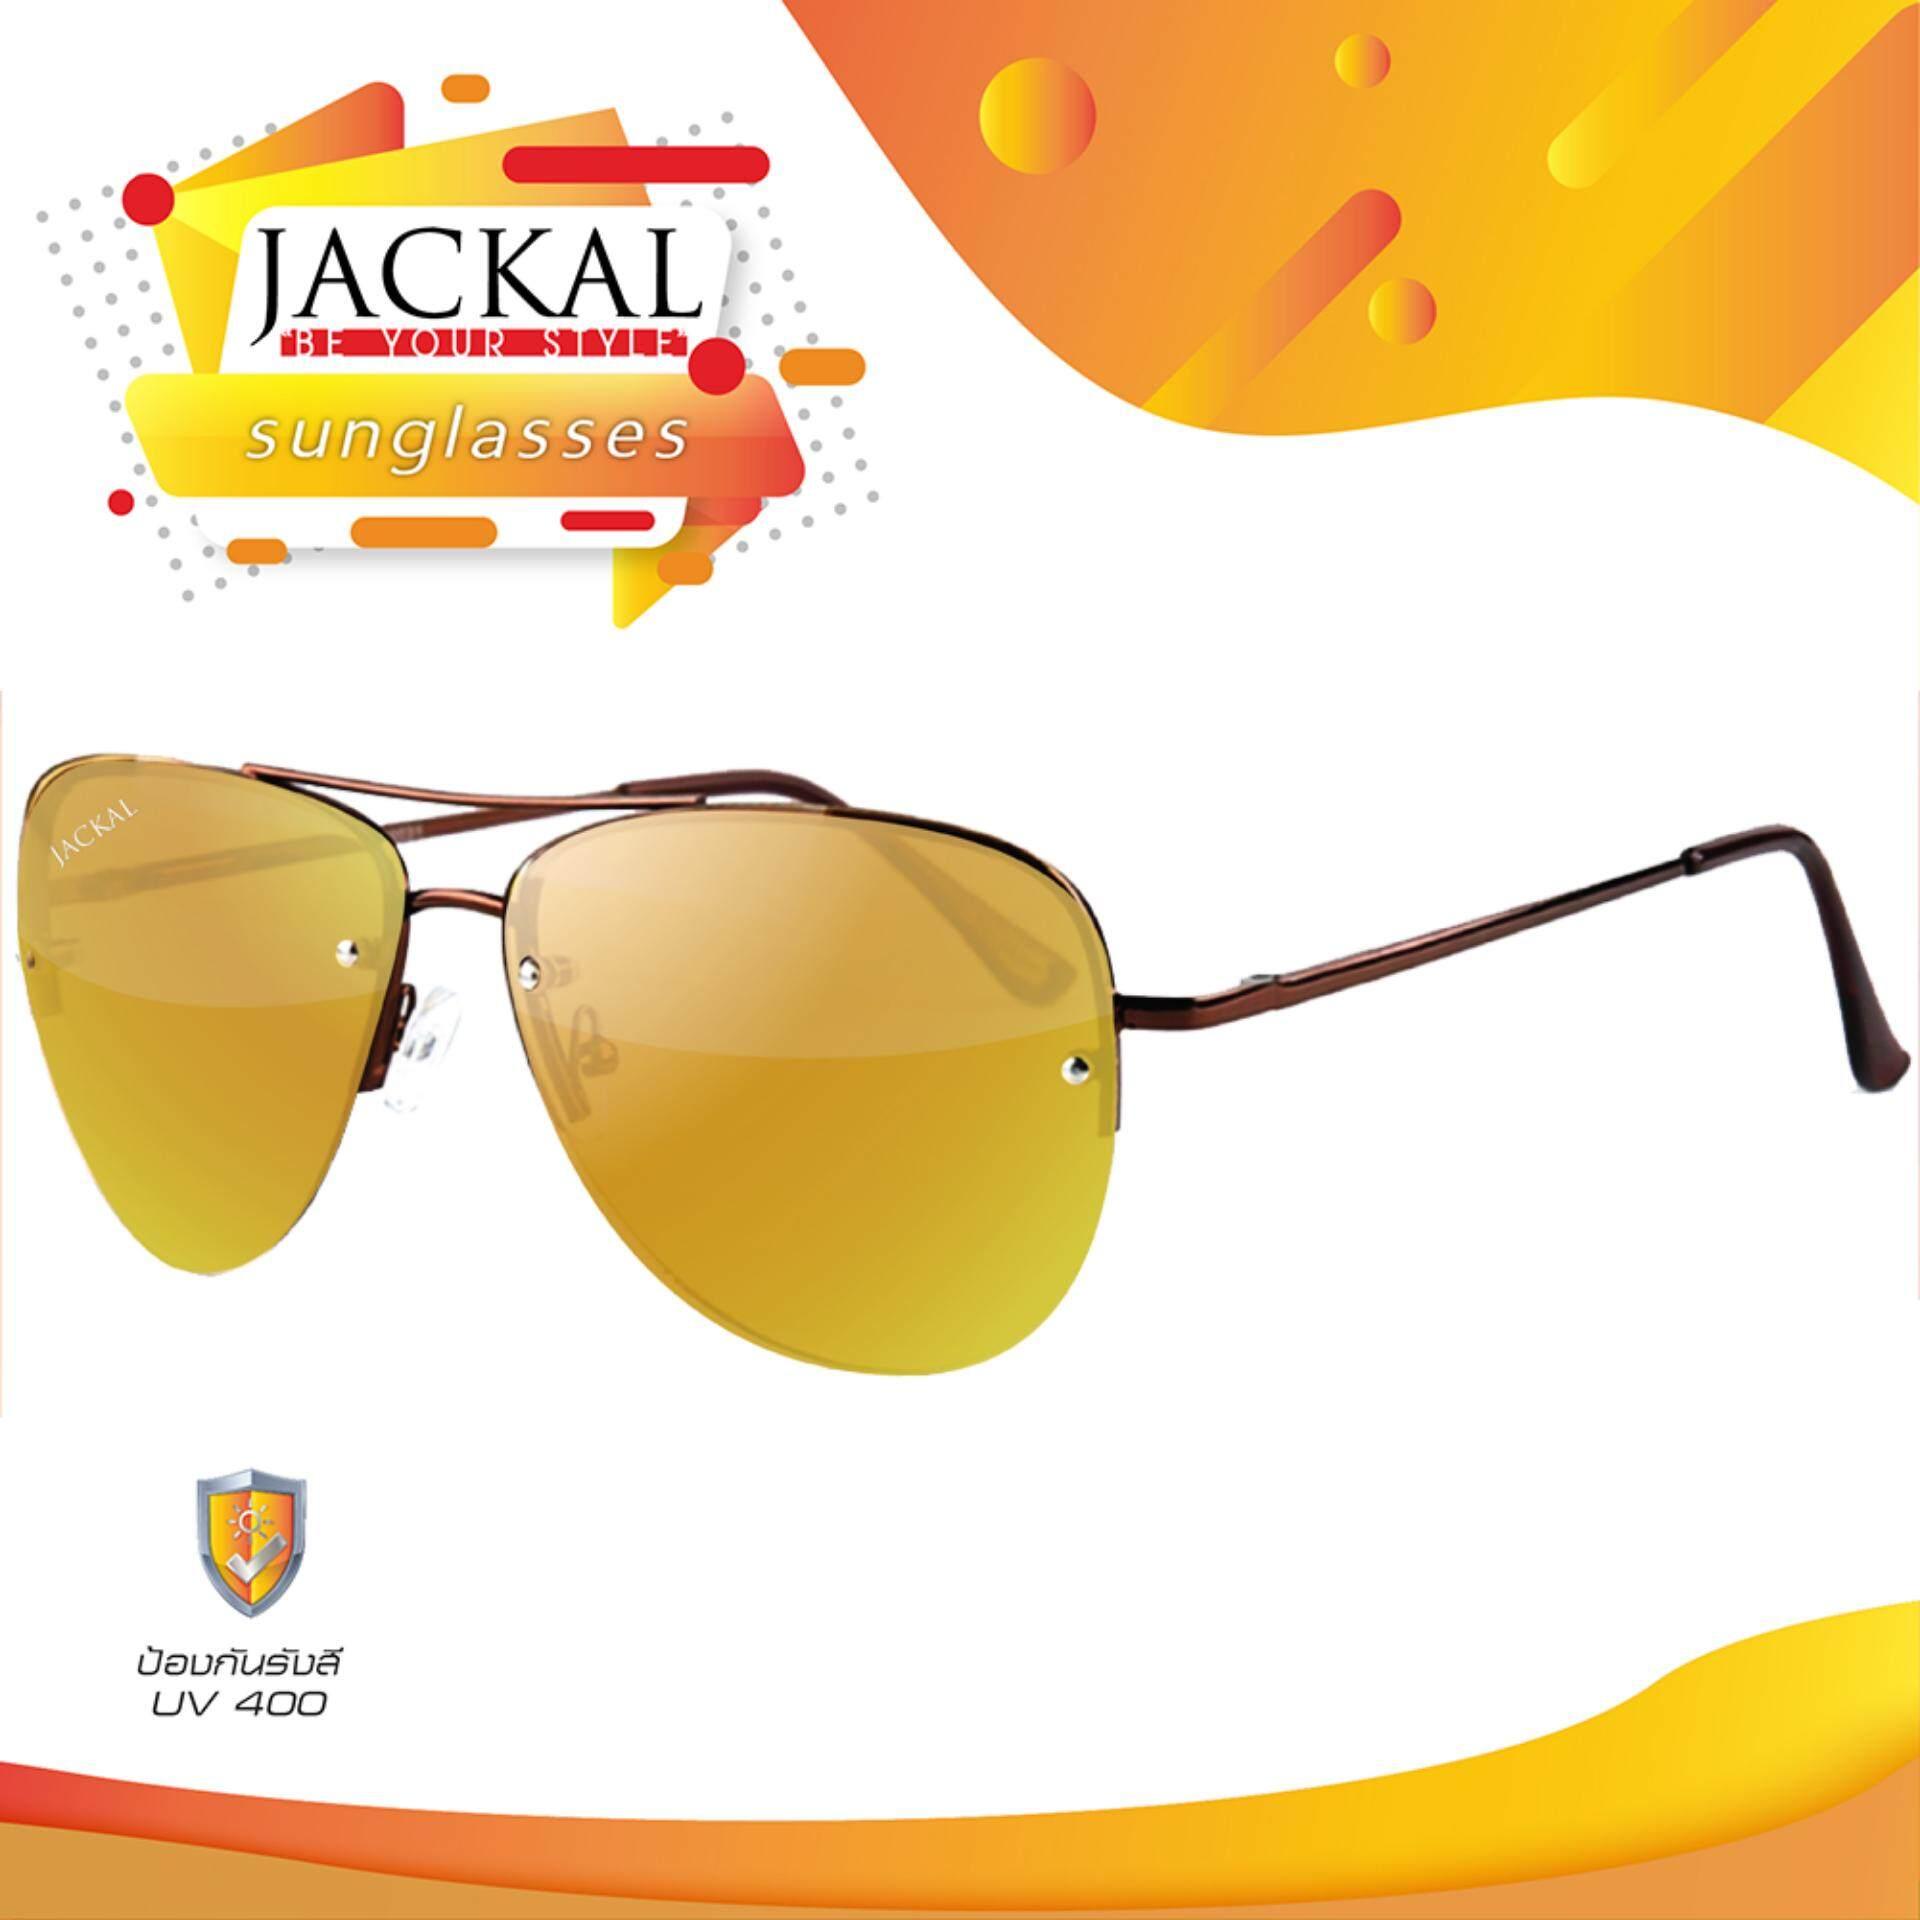 Jackal Sunglasses แว่นตาสำหรับเวลากลางคืน(แจ็คเกิ้ล) รุ่น Shipmaster Ii Js178 (brown/ Yellow Lens) By Jackal Club.